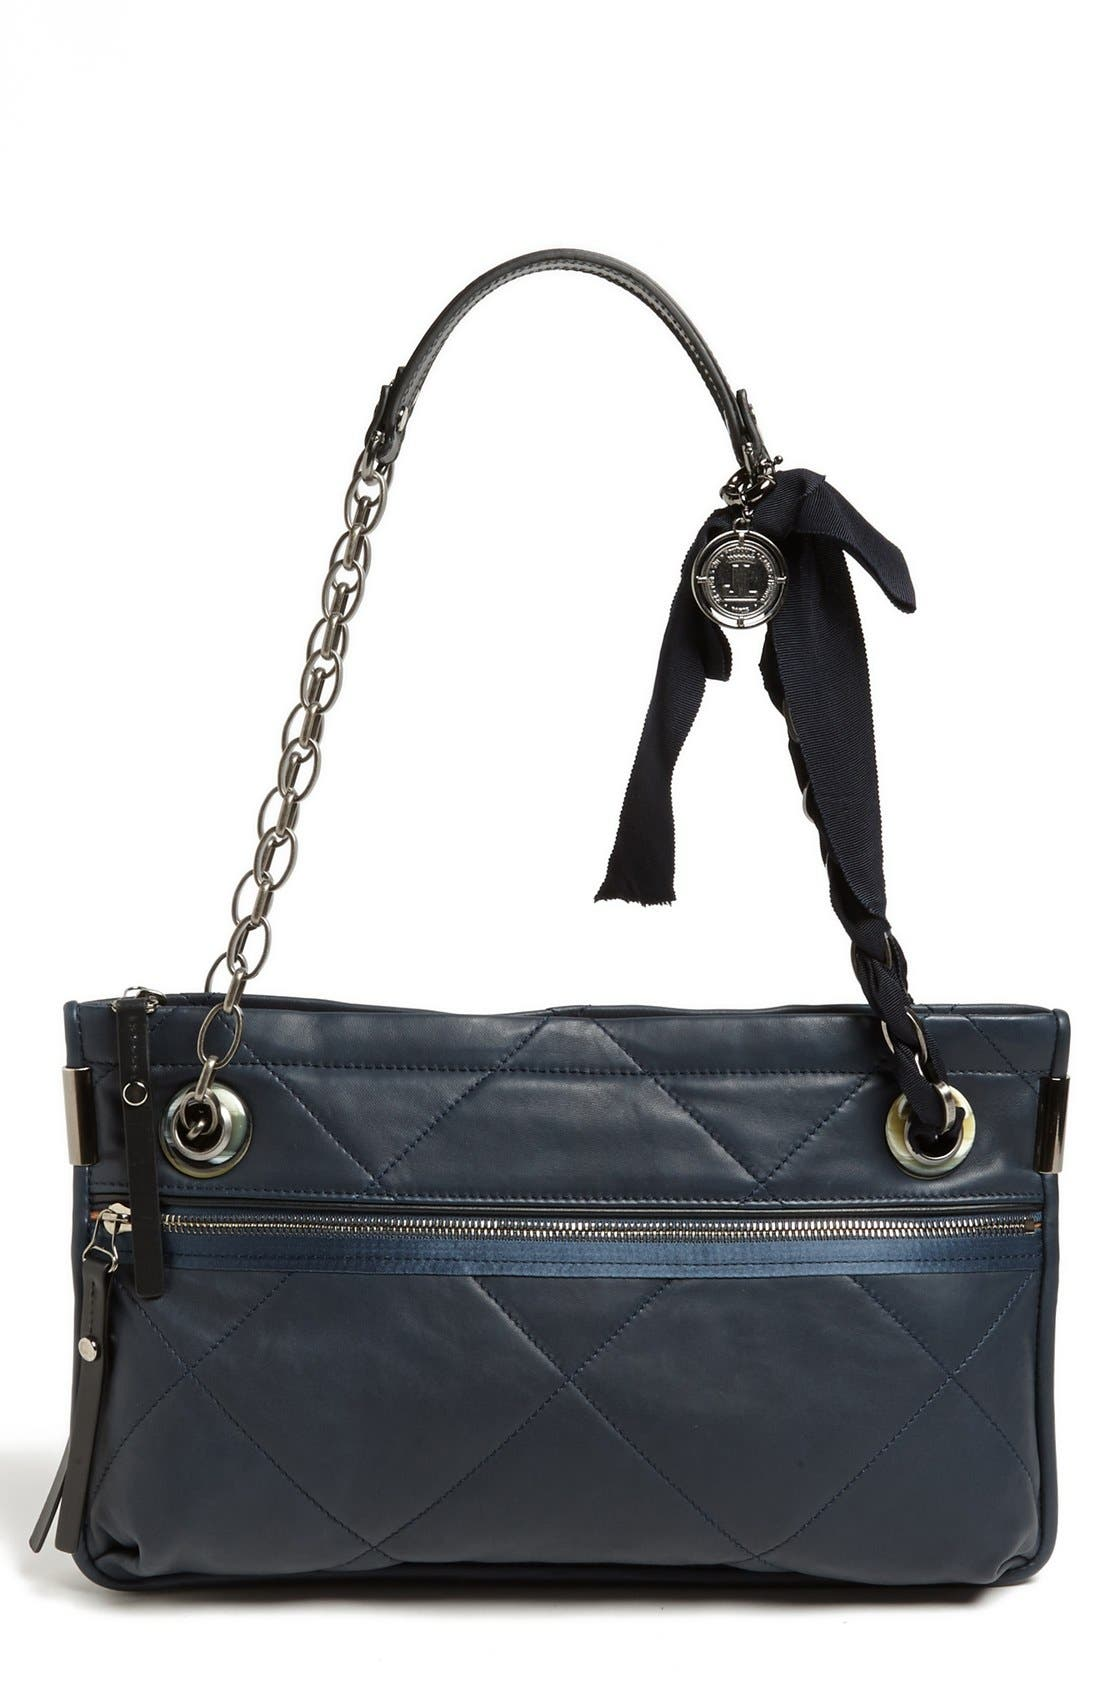 Alternate Image 1 Selected - Lanvin 'Amalia' Shoulder Bag, Small